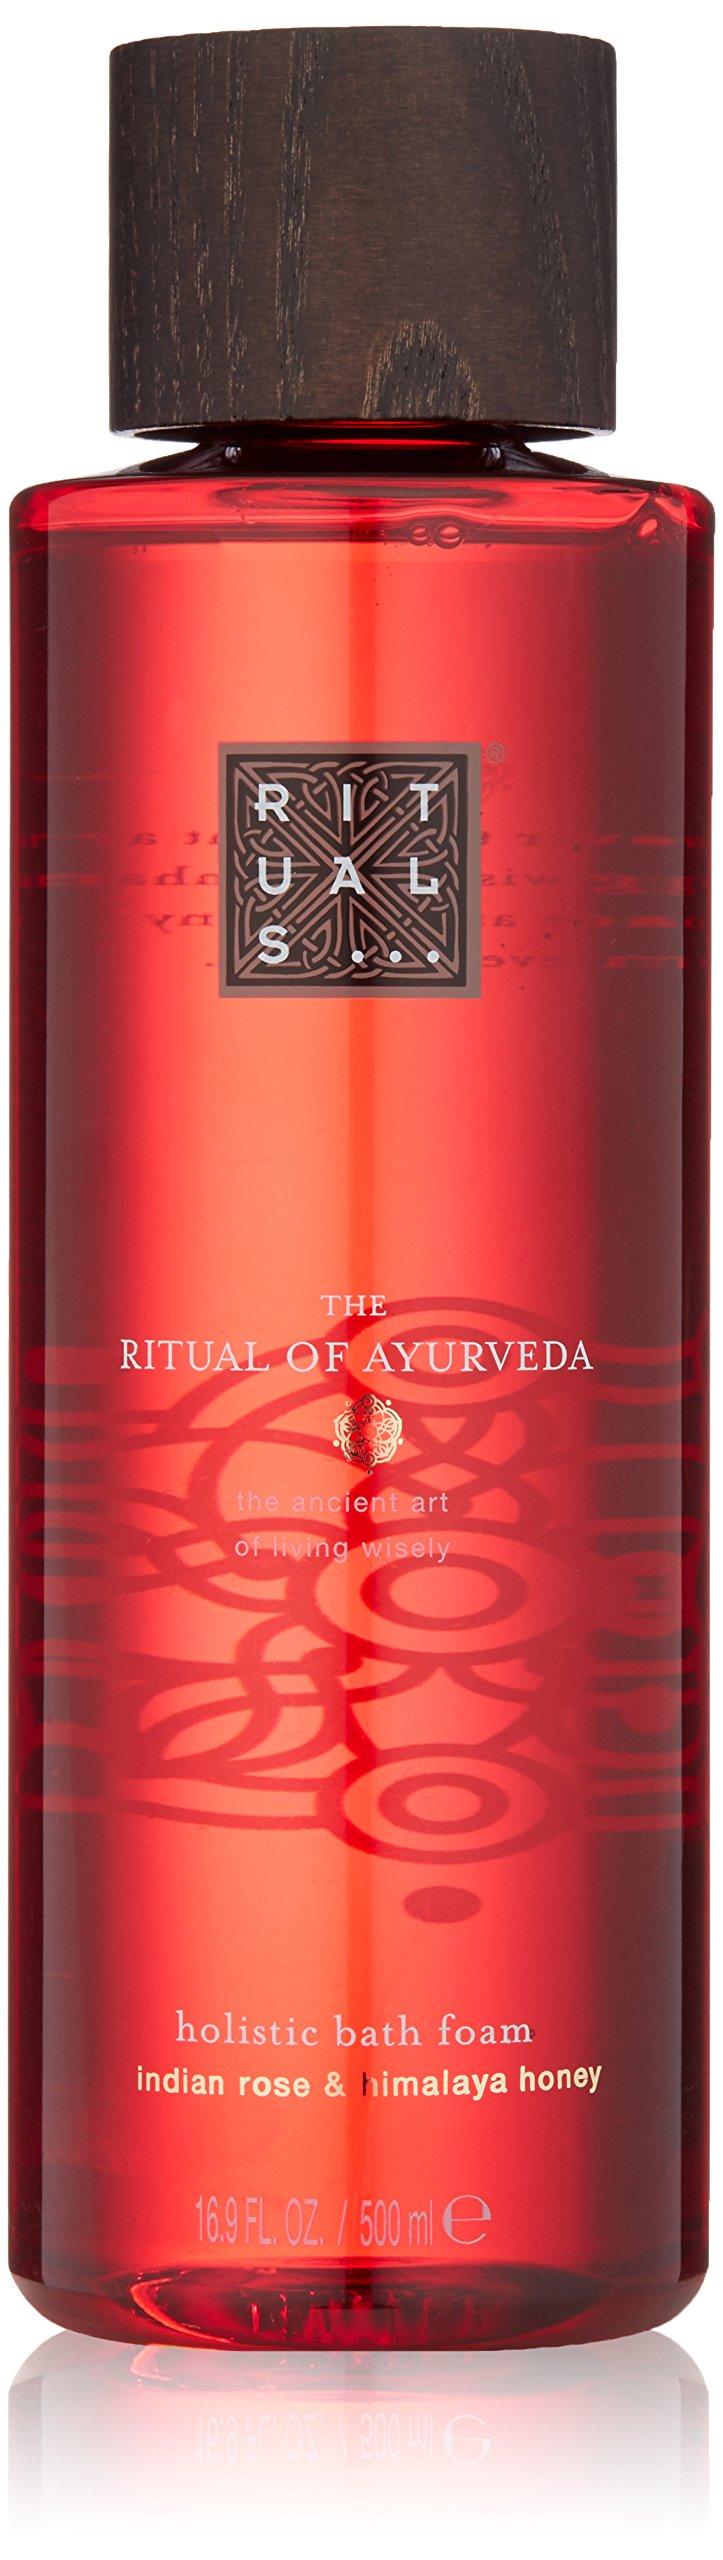 RITUALS The RITUALS of Ayurveda Bath Foam, 500 ml